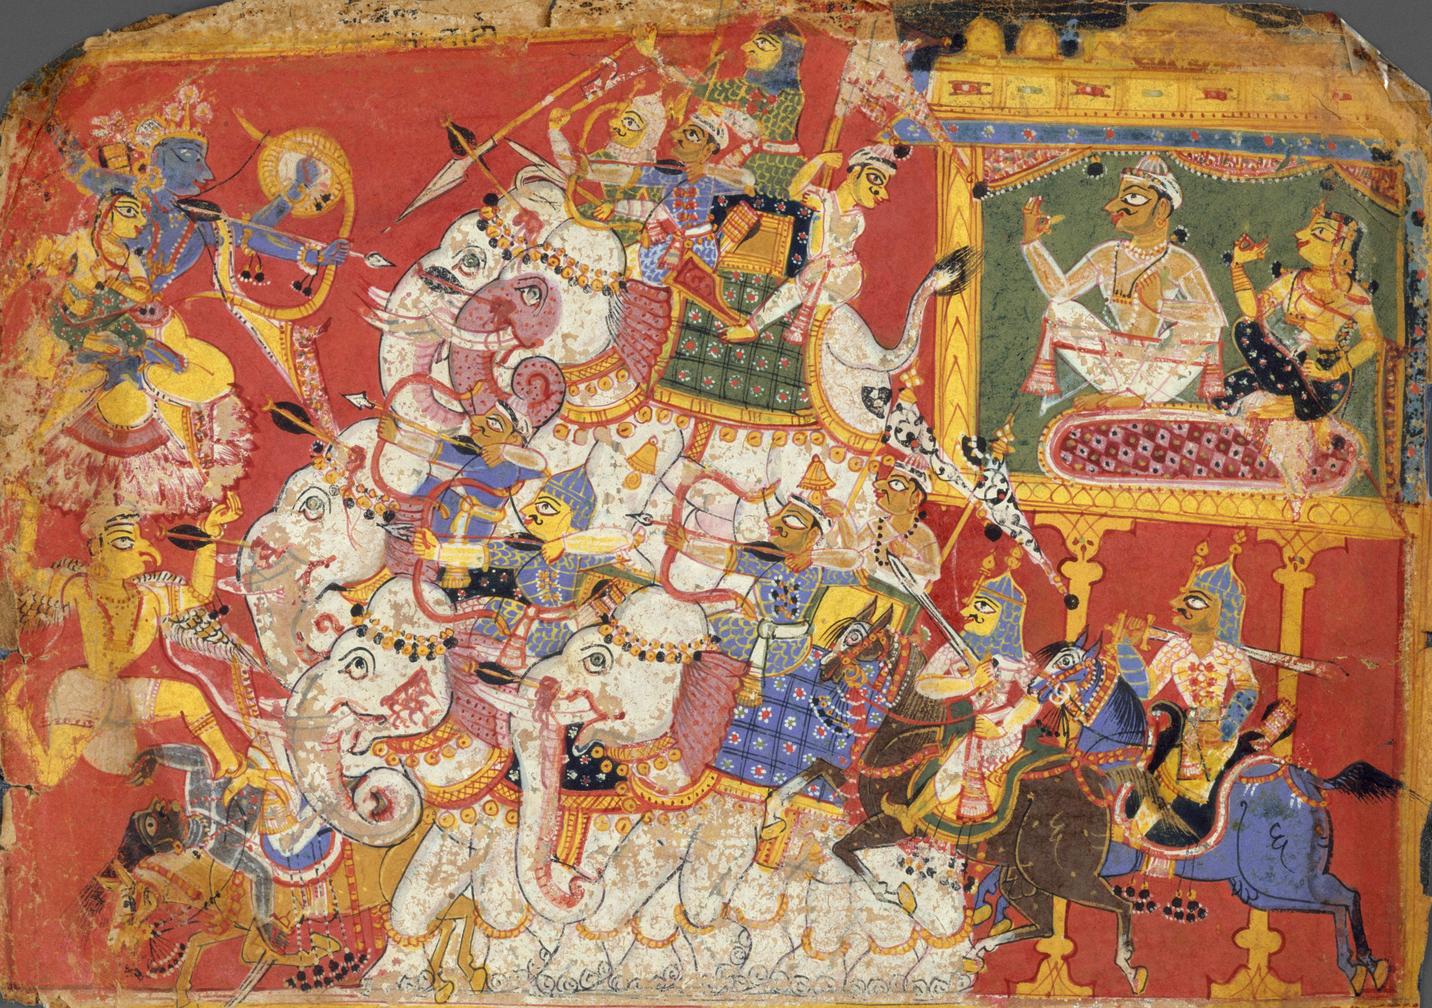 Krishna and Narakasura: The Tale of Dharma Asserting Over Adharma